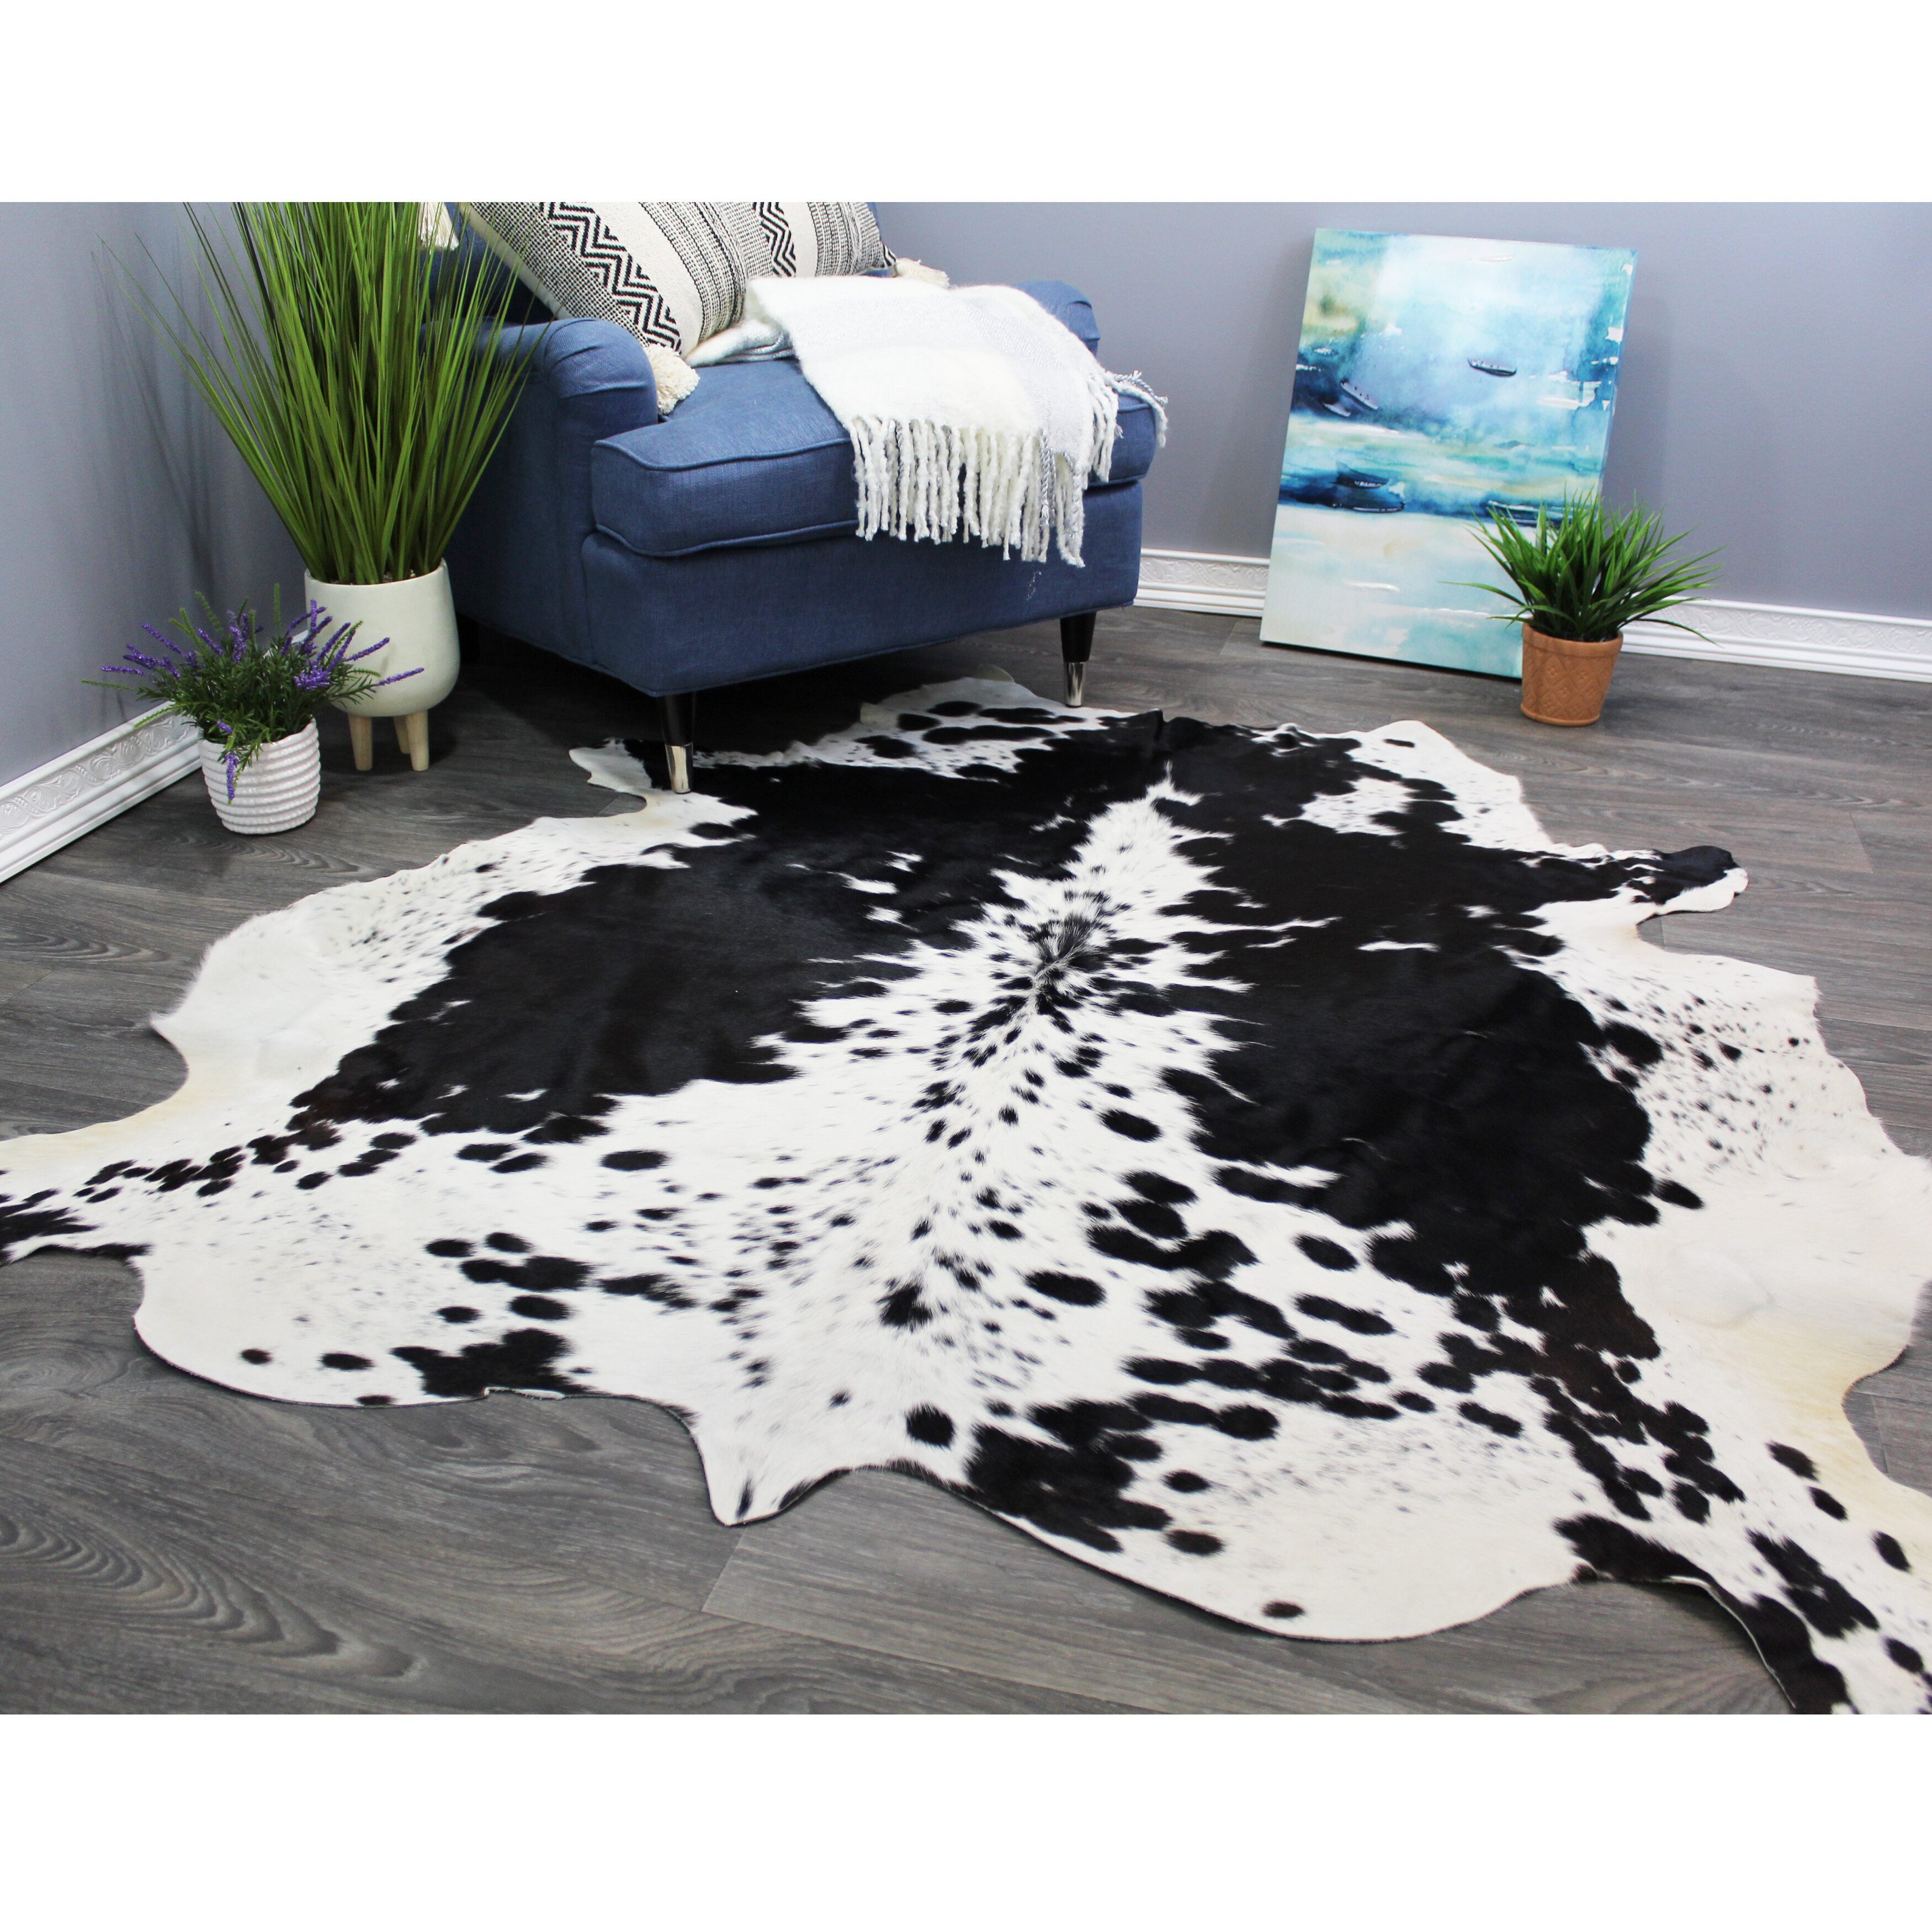 Wunder Cowhide Black White Area Rug